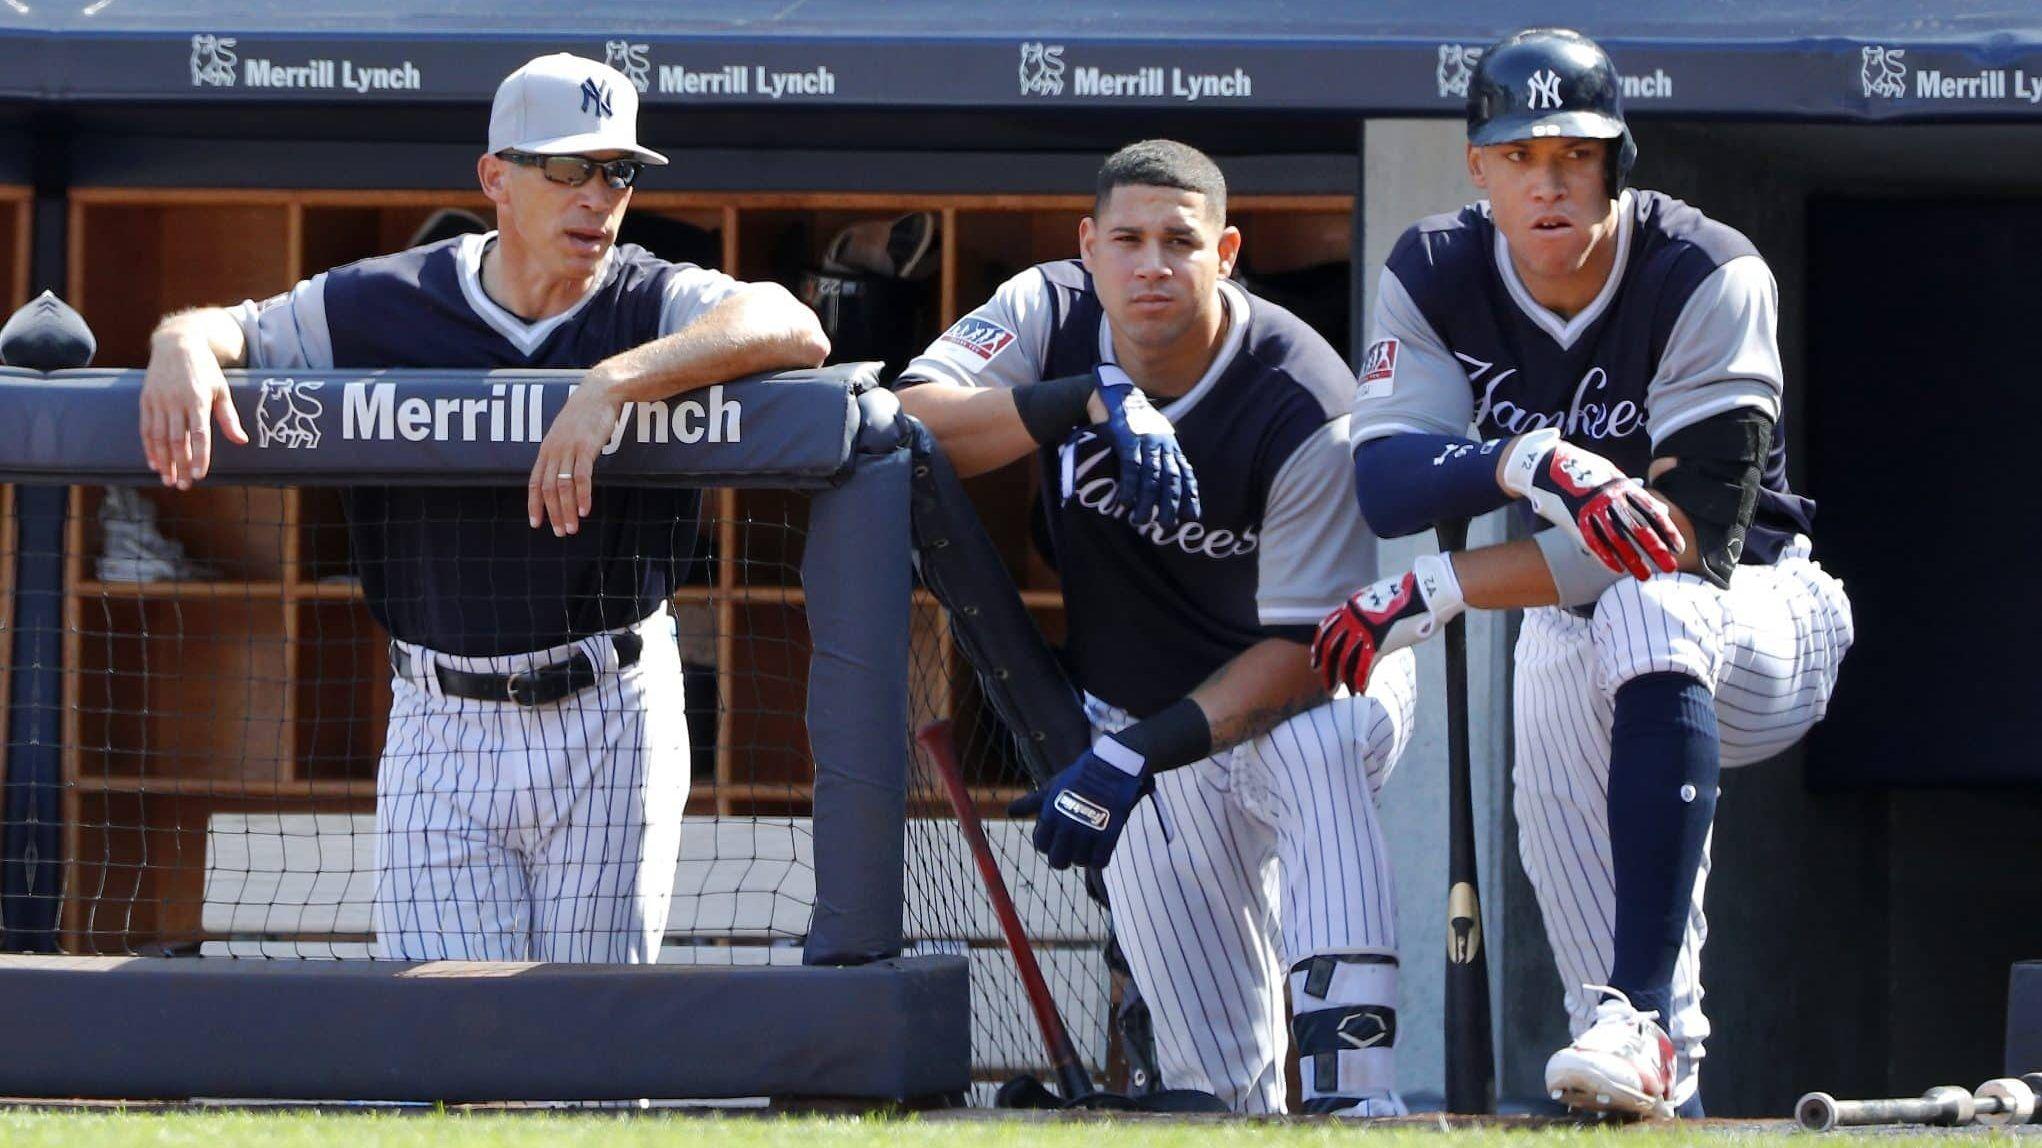 Former New York Yankees Skipper Joe Girardi Is Still Trying To Fix Gary Sanchez S Sometimes Mediocre Ways Behind The P Gary Sanchez New York Yankees Ny Yankees